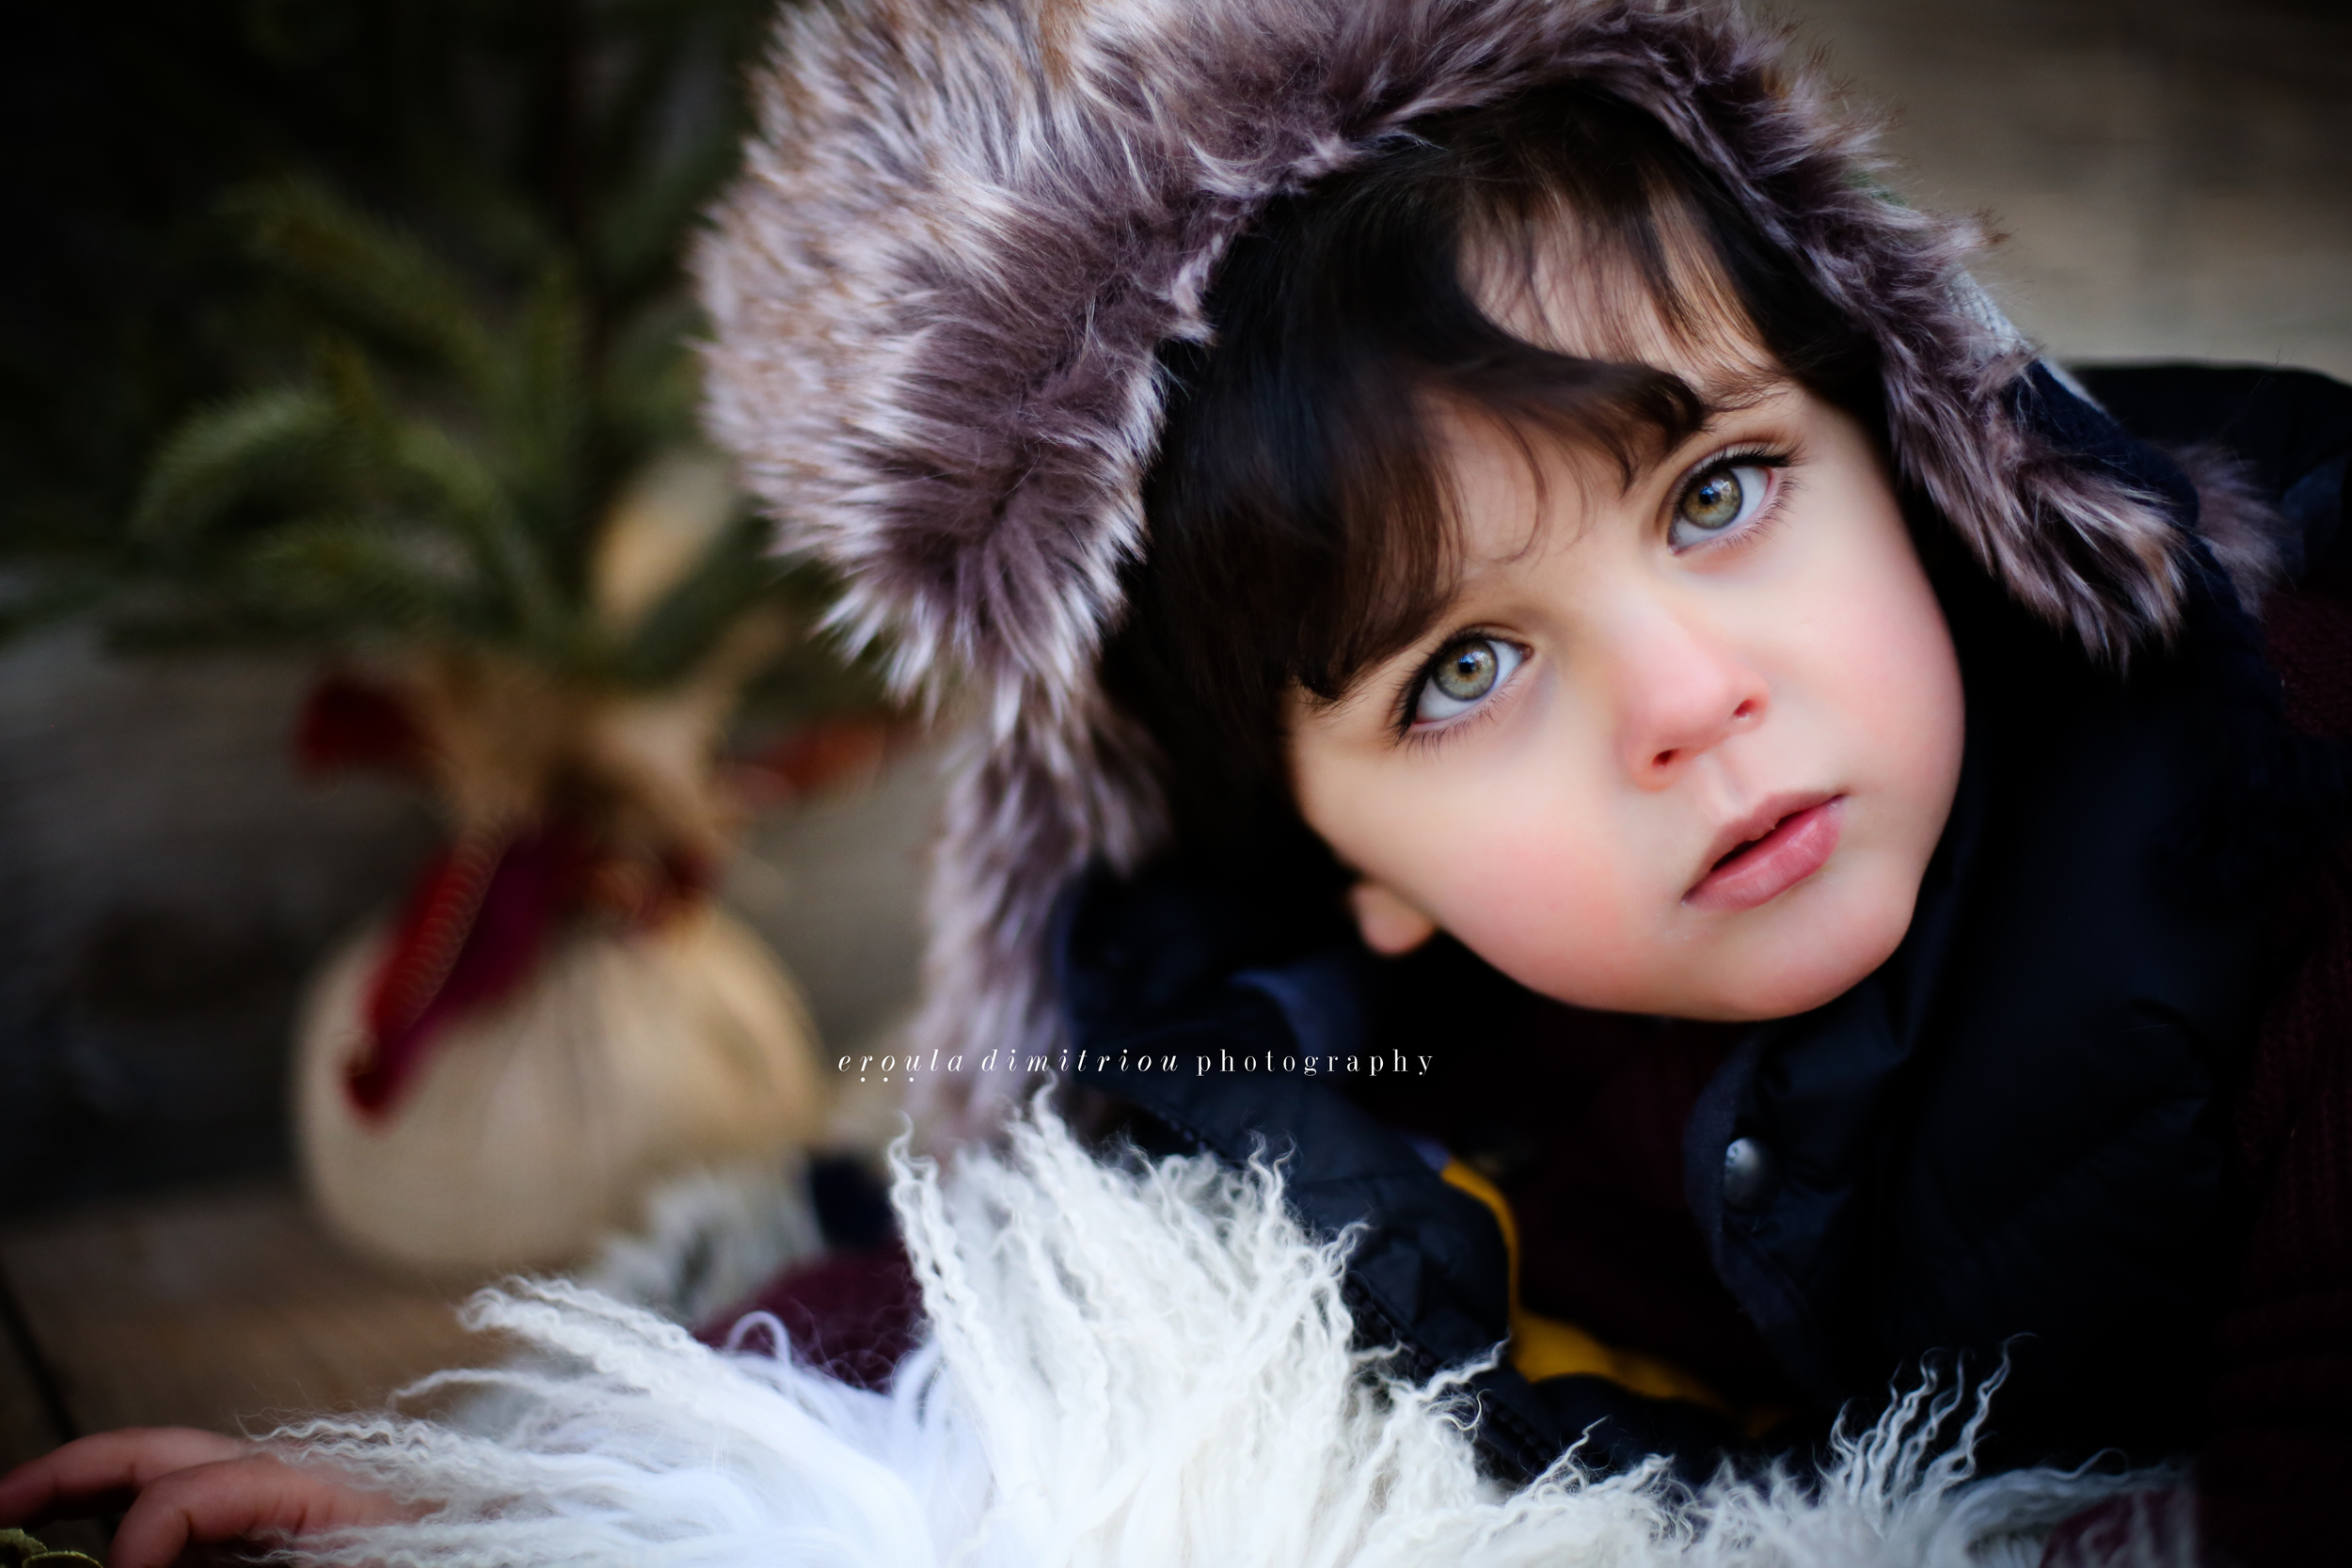 Eroula Dimitriou Photography